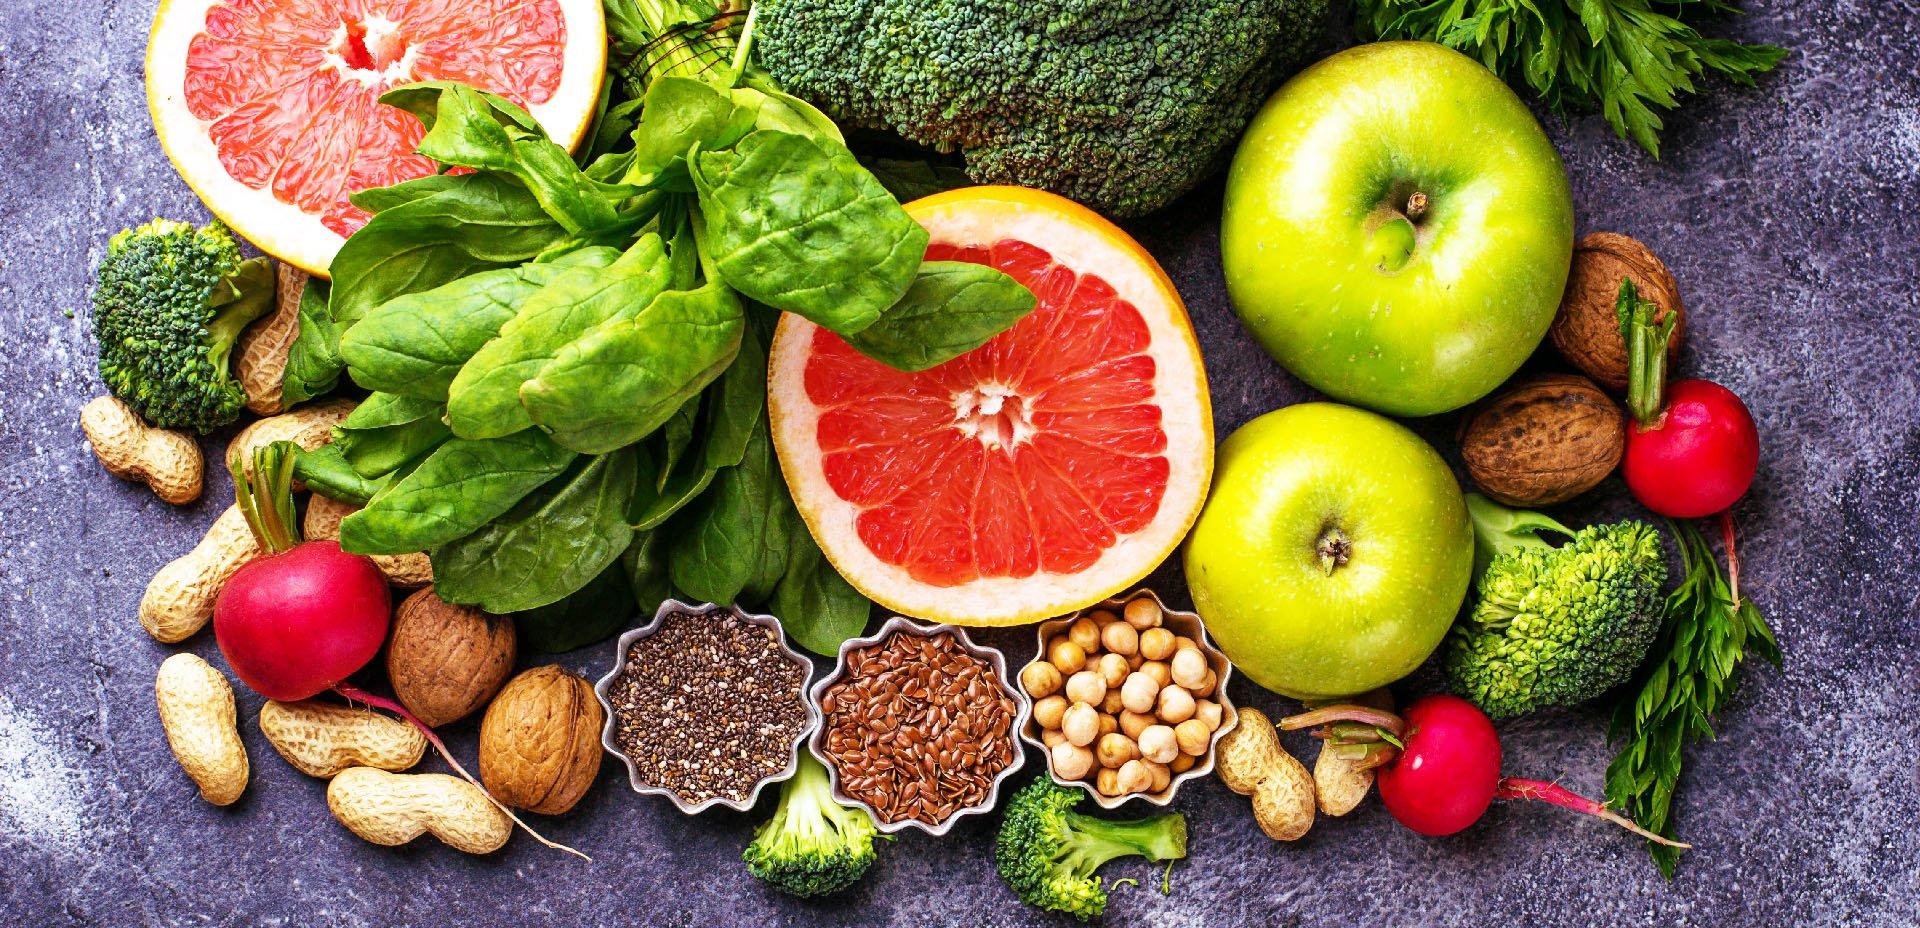 frutta, verdura, semi